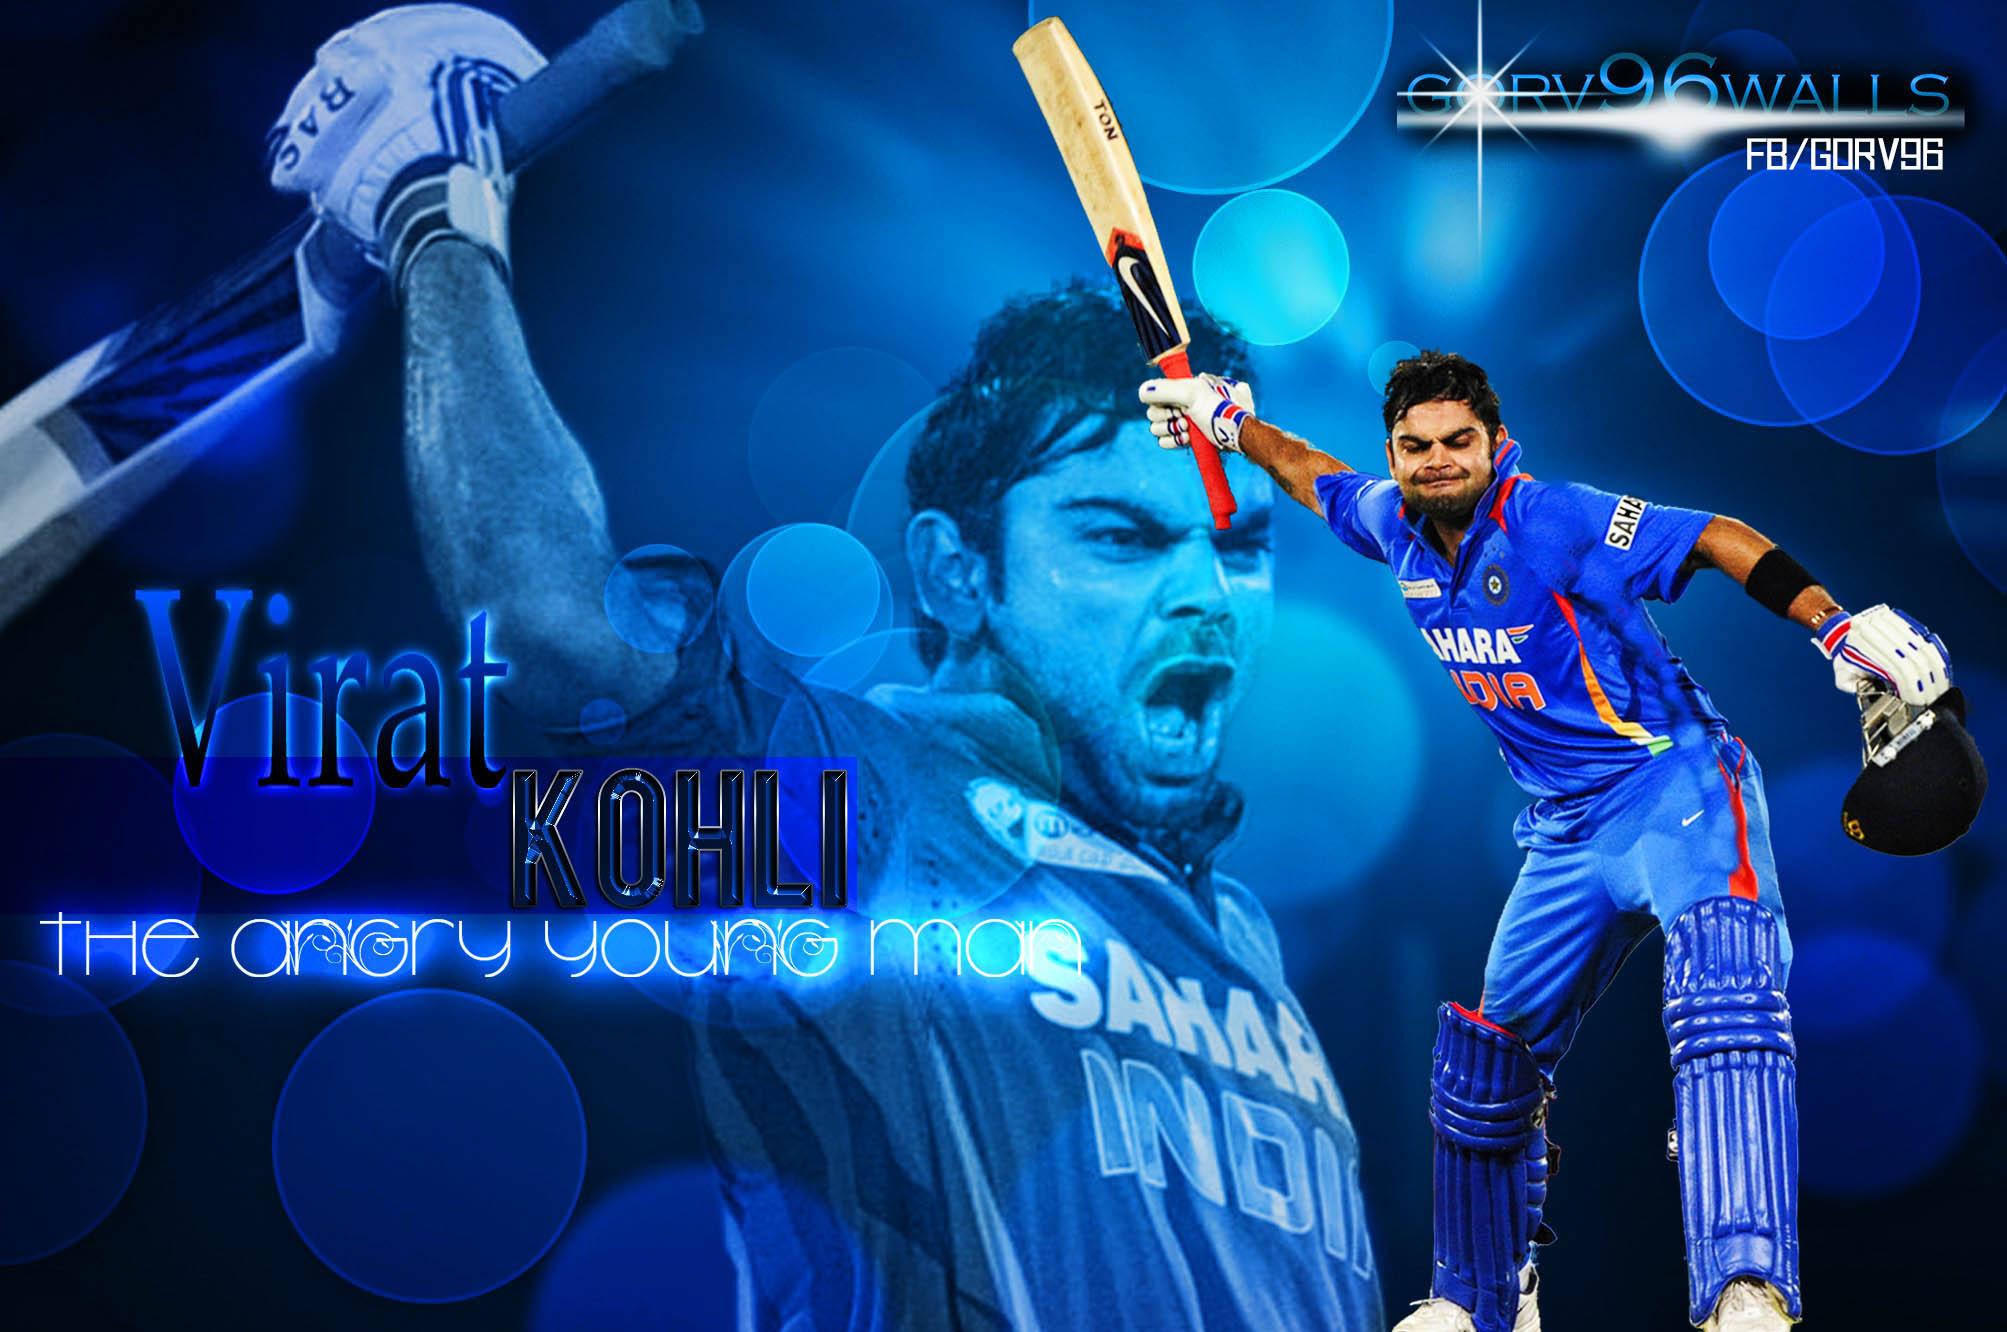 Virat Kohli Kohli Cricket Batsman Wallpaper Resolution 2007x1332 Id 635839 Wallha Com Virat kohli's profile including their story, stats, height, facts and career info. virat kohli kohli cricket batsman